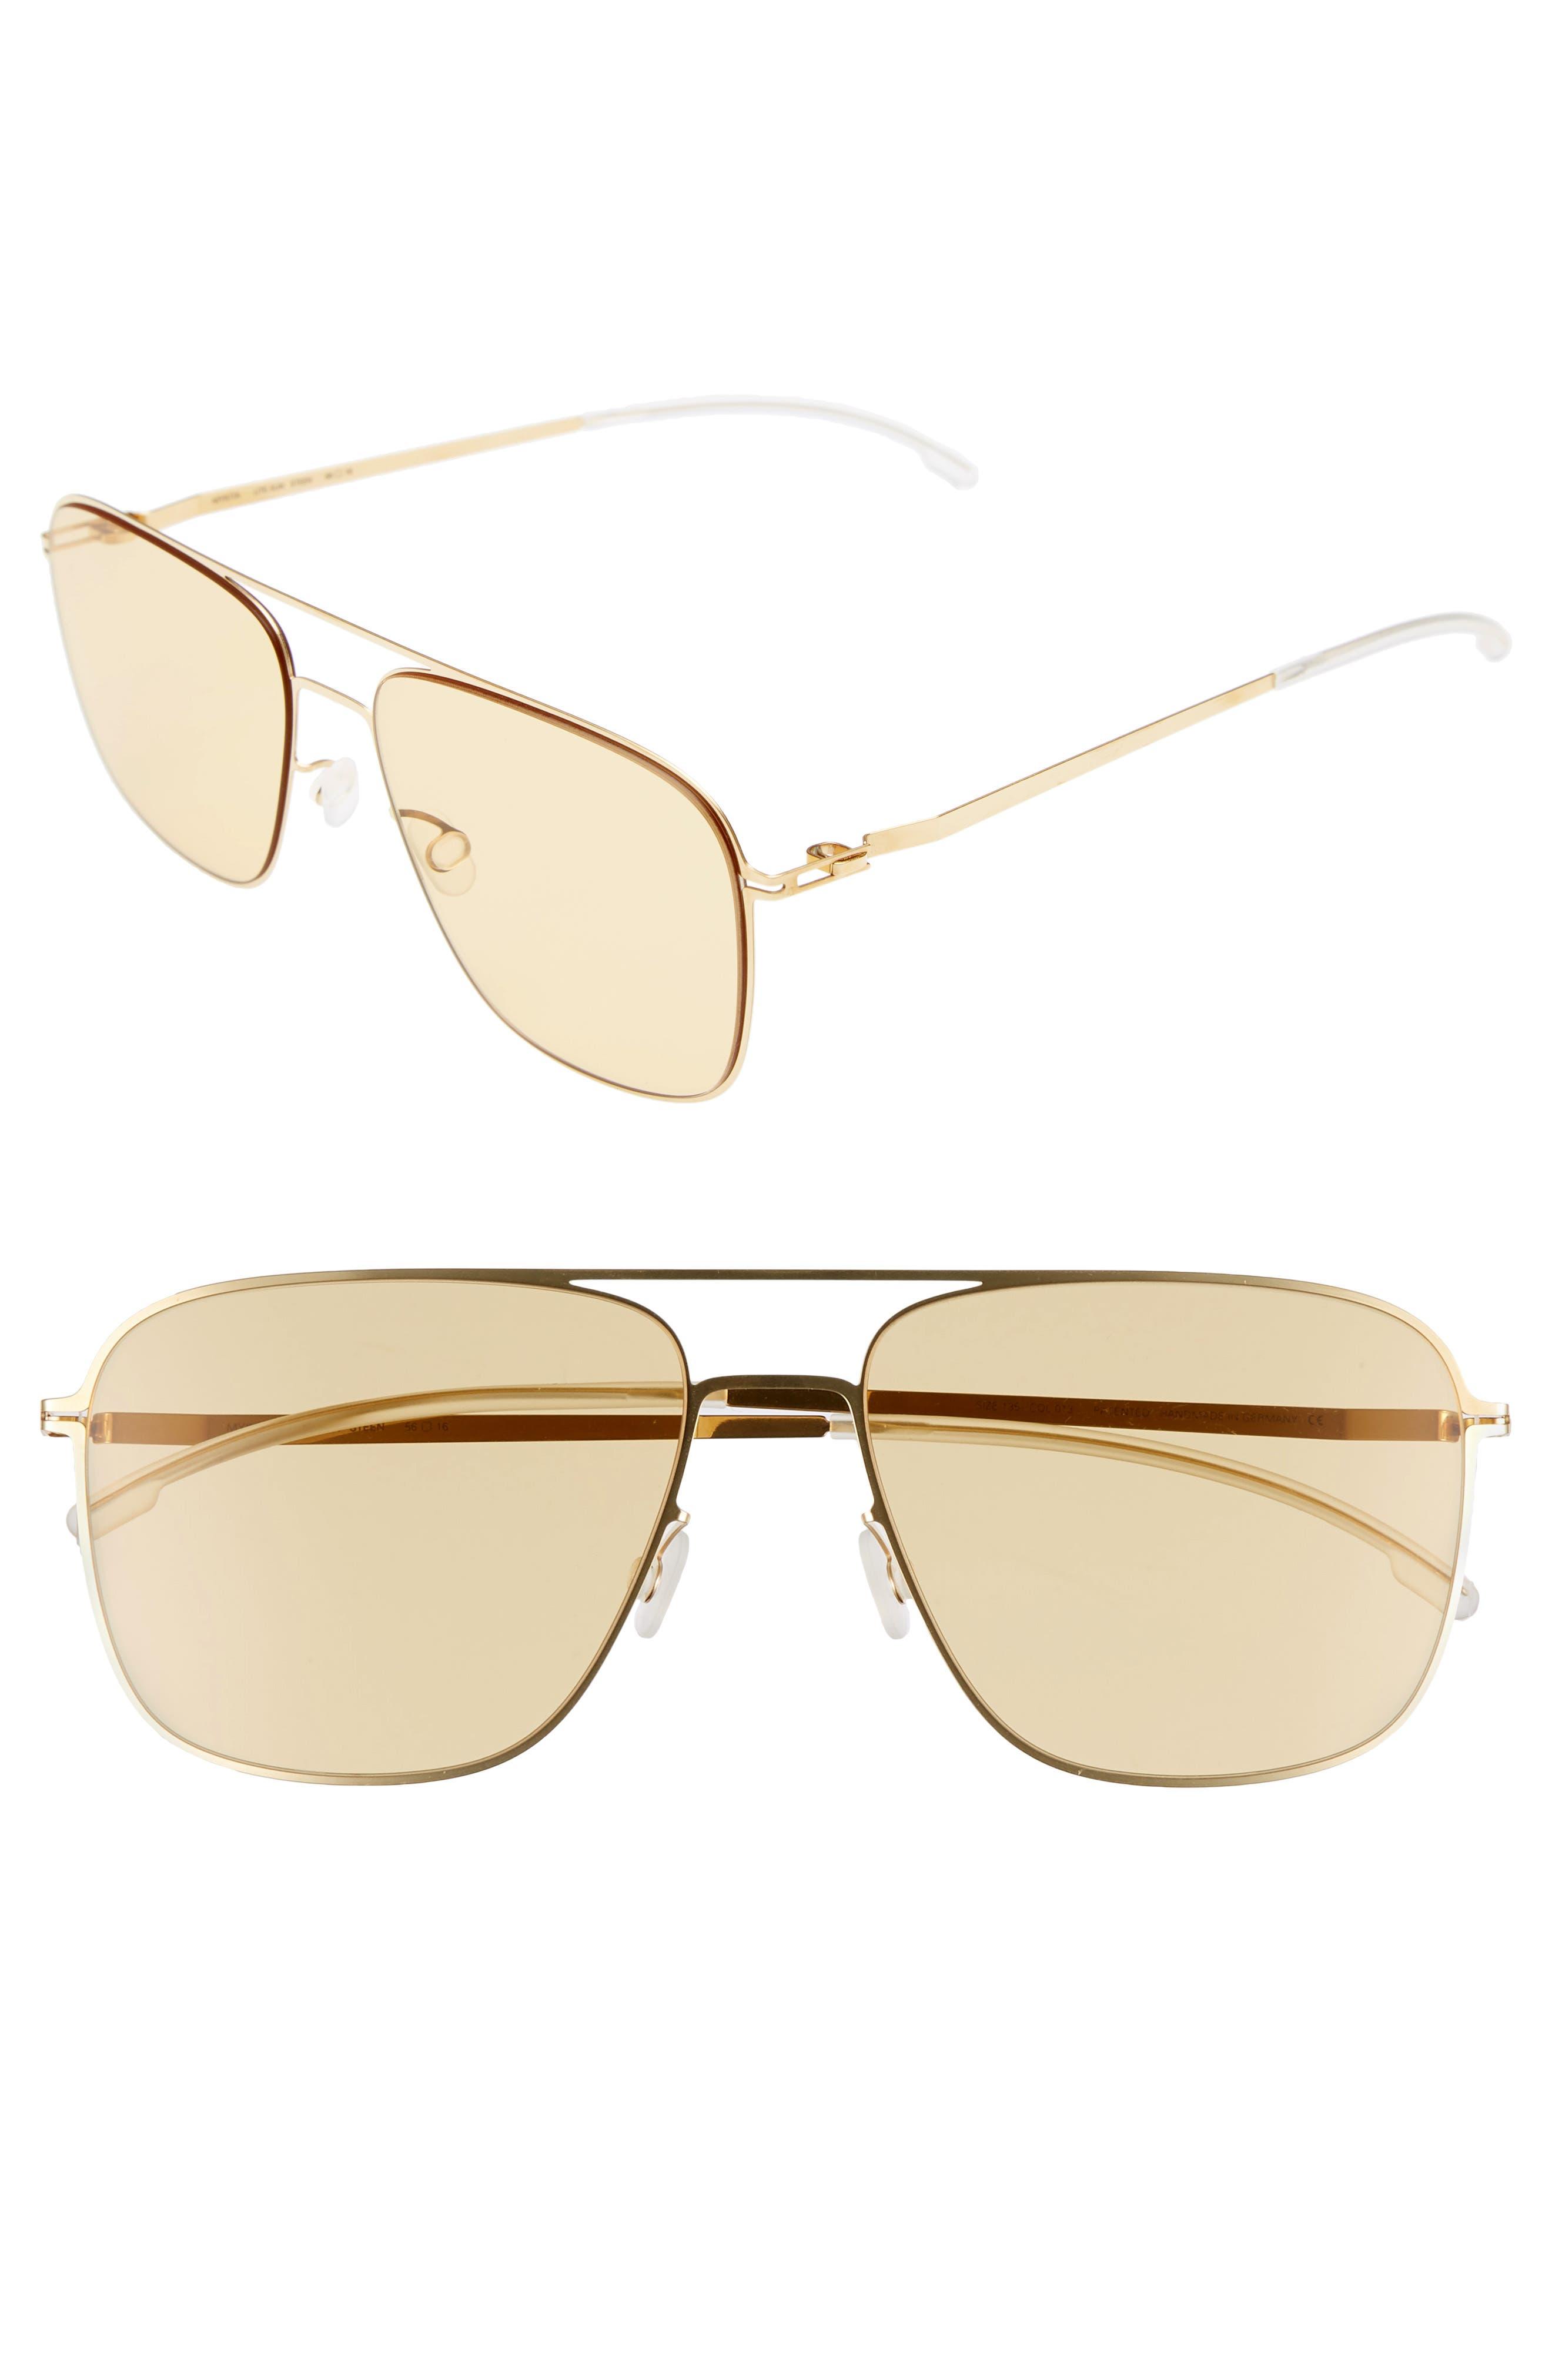 Steen 56mm Aviator Sunglasses,                             Main thumbnail 1, color,                             Glossy Gold